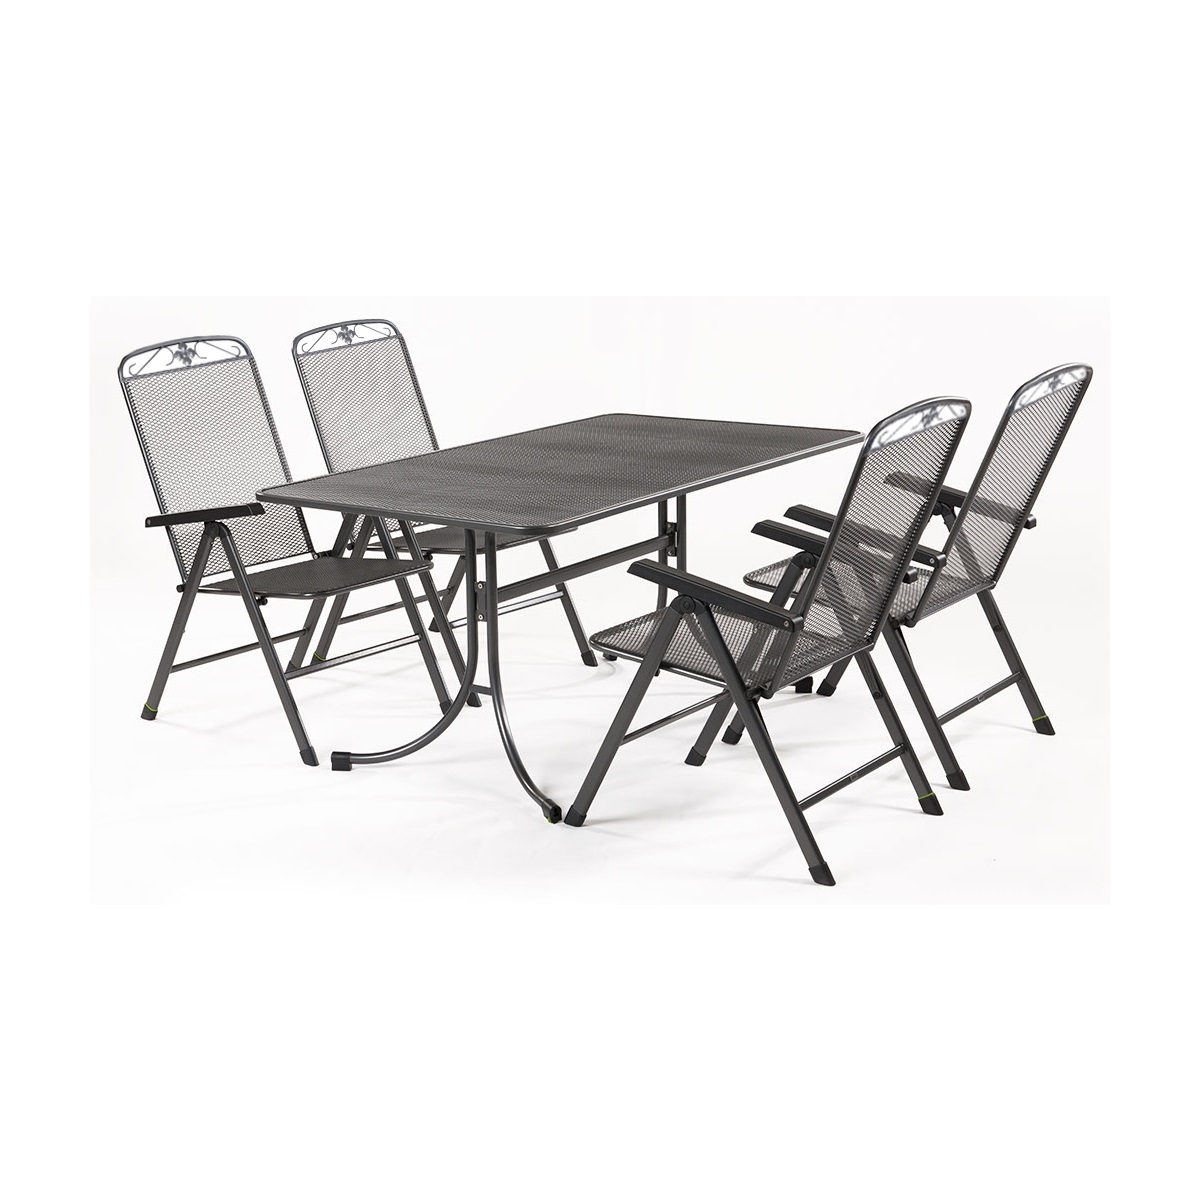 MWH Basanis 4+, sestava nábytku z tahokovu (4x pol. křeslo Savoy, 1x stůl Universal 160)